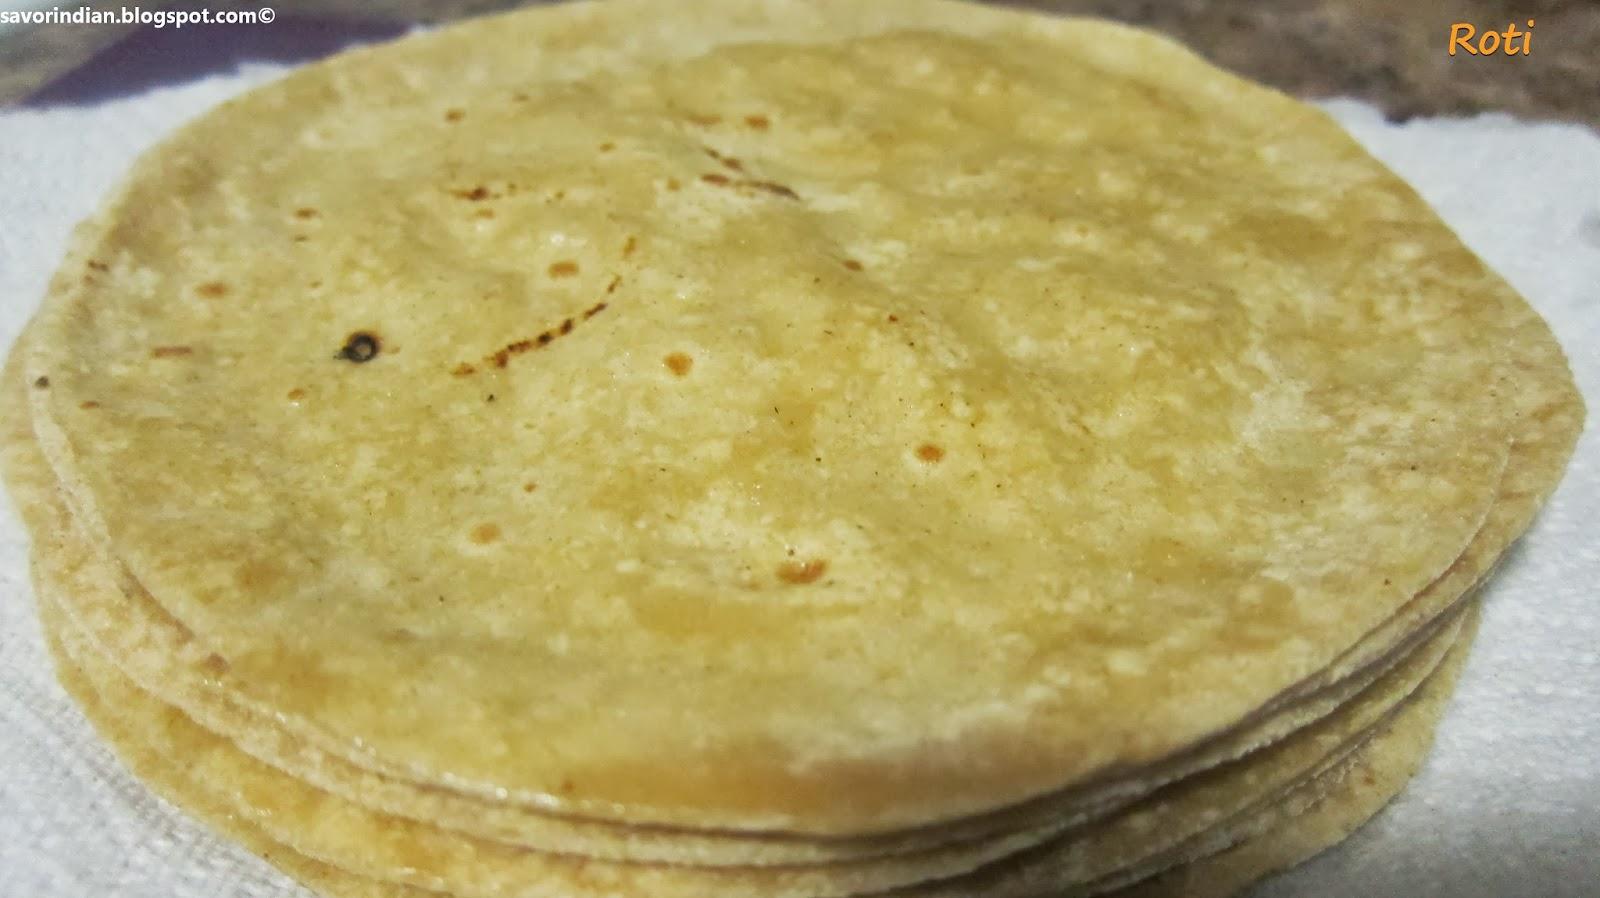 Phulka /Soft Roti/Chapati/Indian Bread Recipe - Indian fare and more...